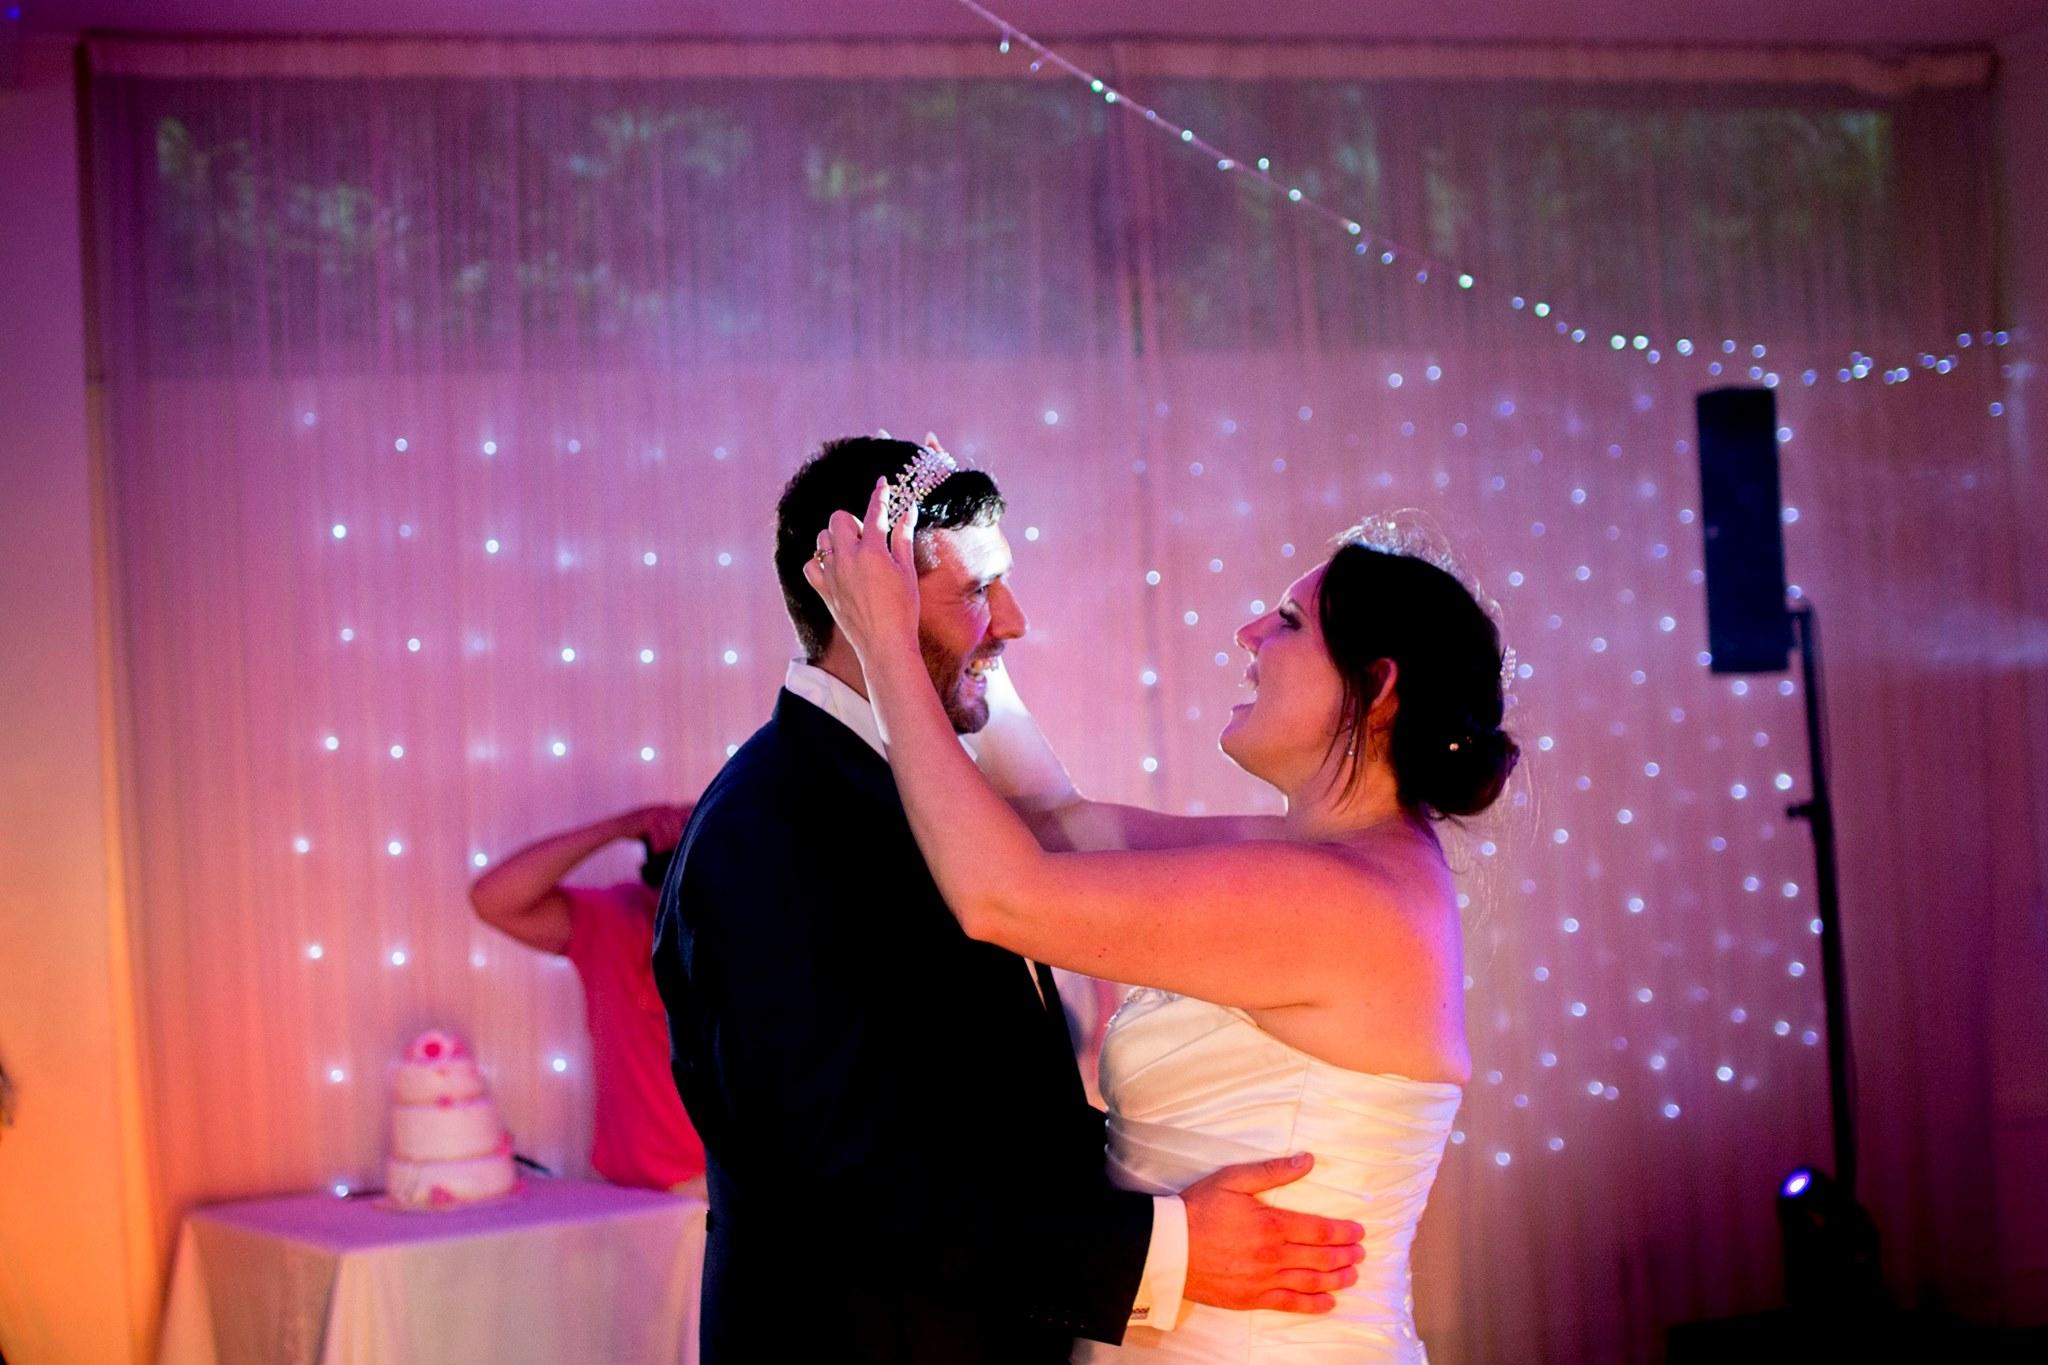 cornwall wedding disco dj photographer 28